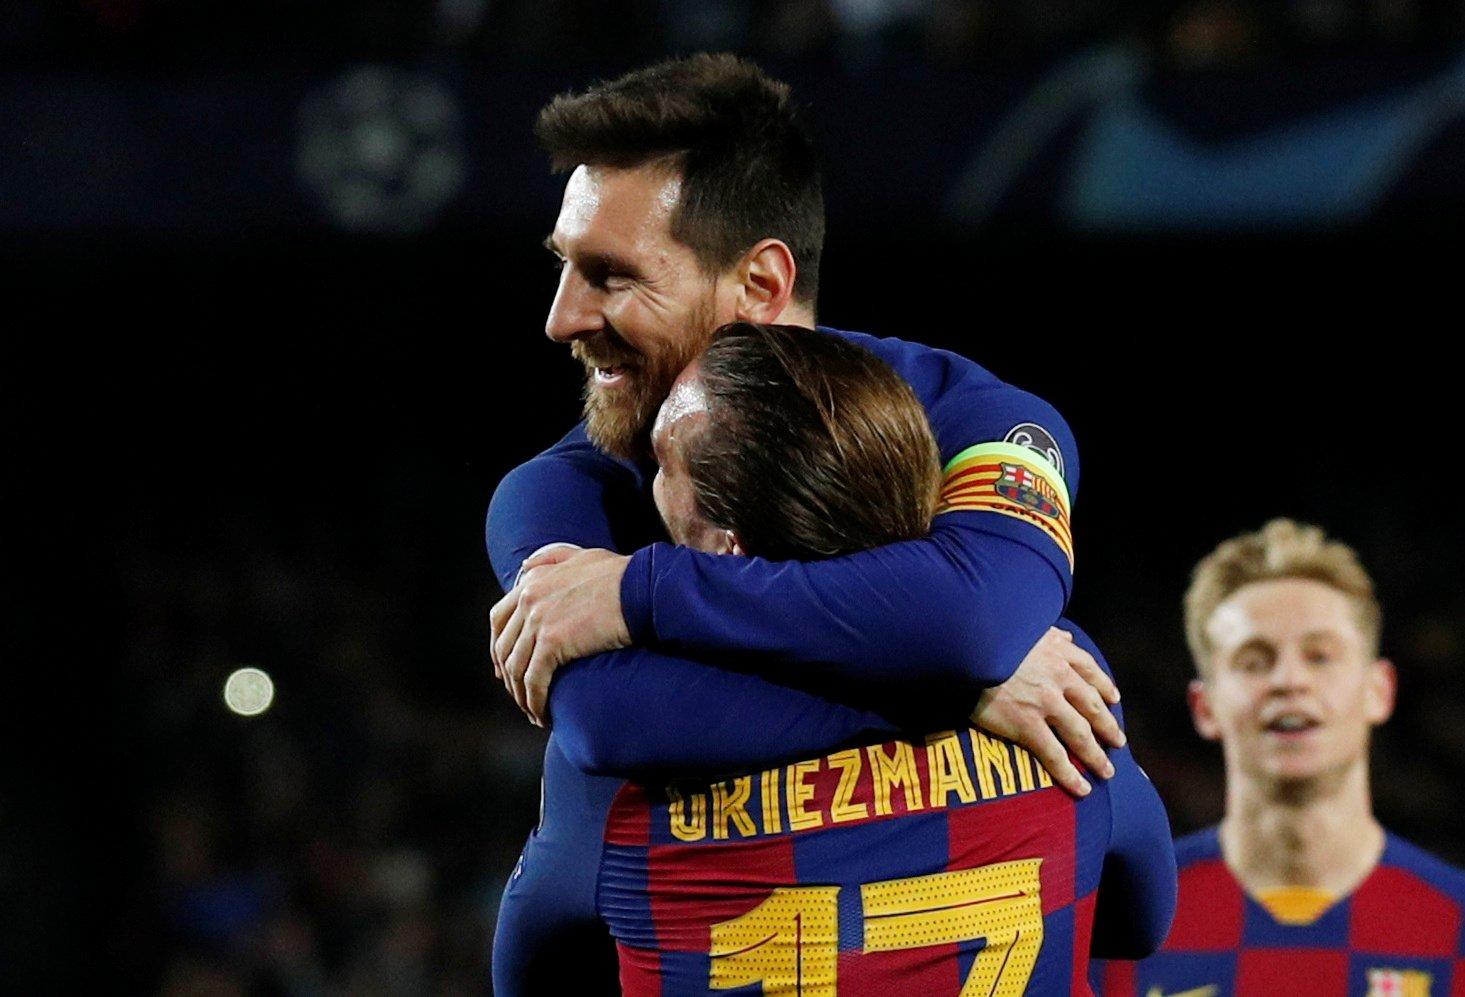 FC Barcelona Top Scorers This Season 19/20: Top Scorers So Far